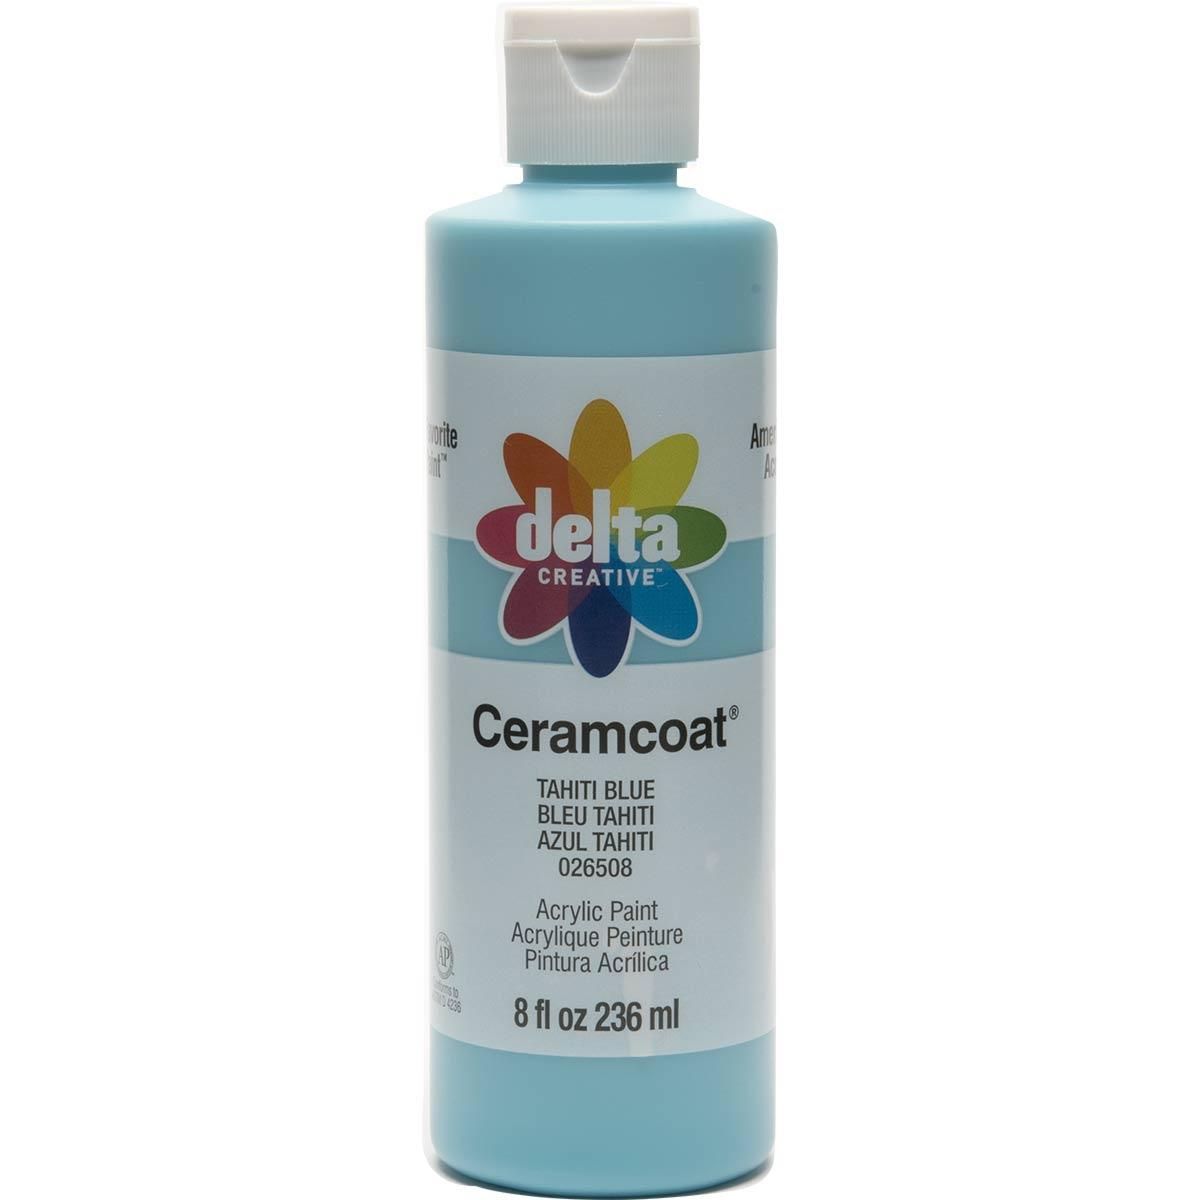 Delta Ceramcoat ® Acrylic Paint - Tahiti Blue, 8 oz.